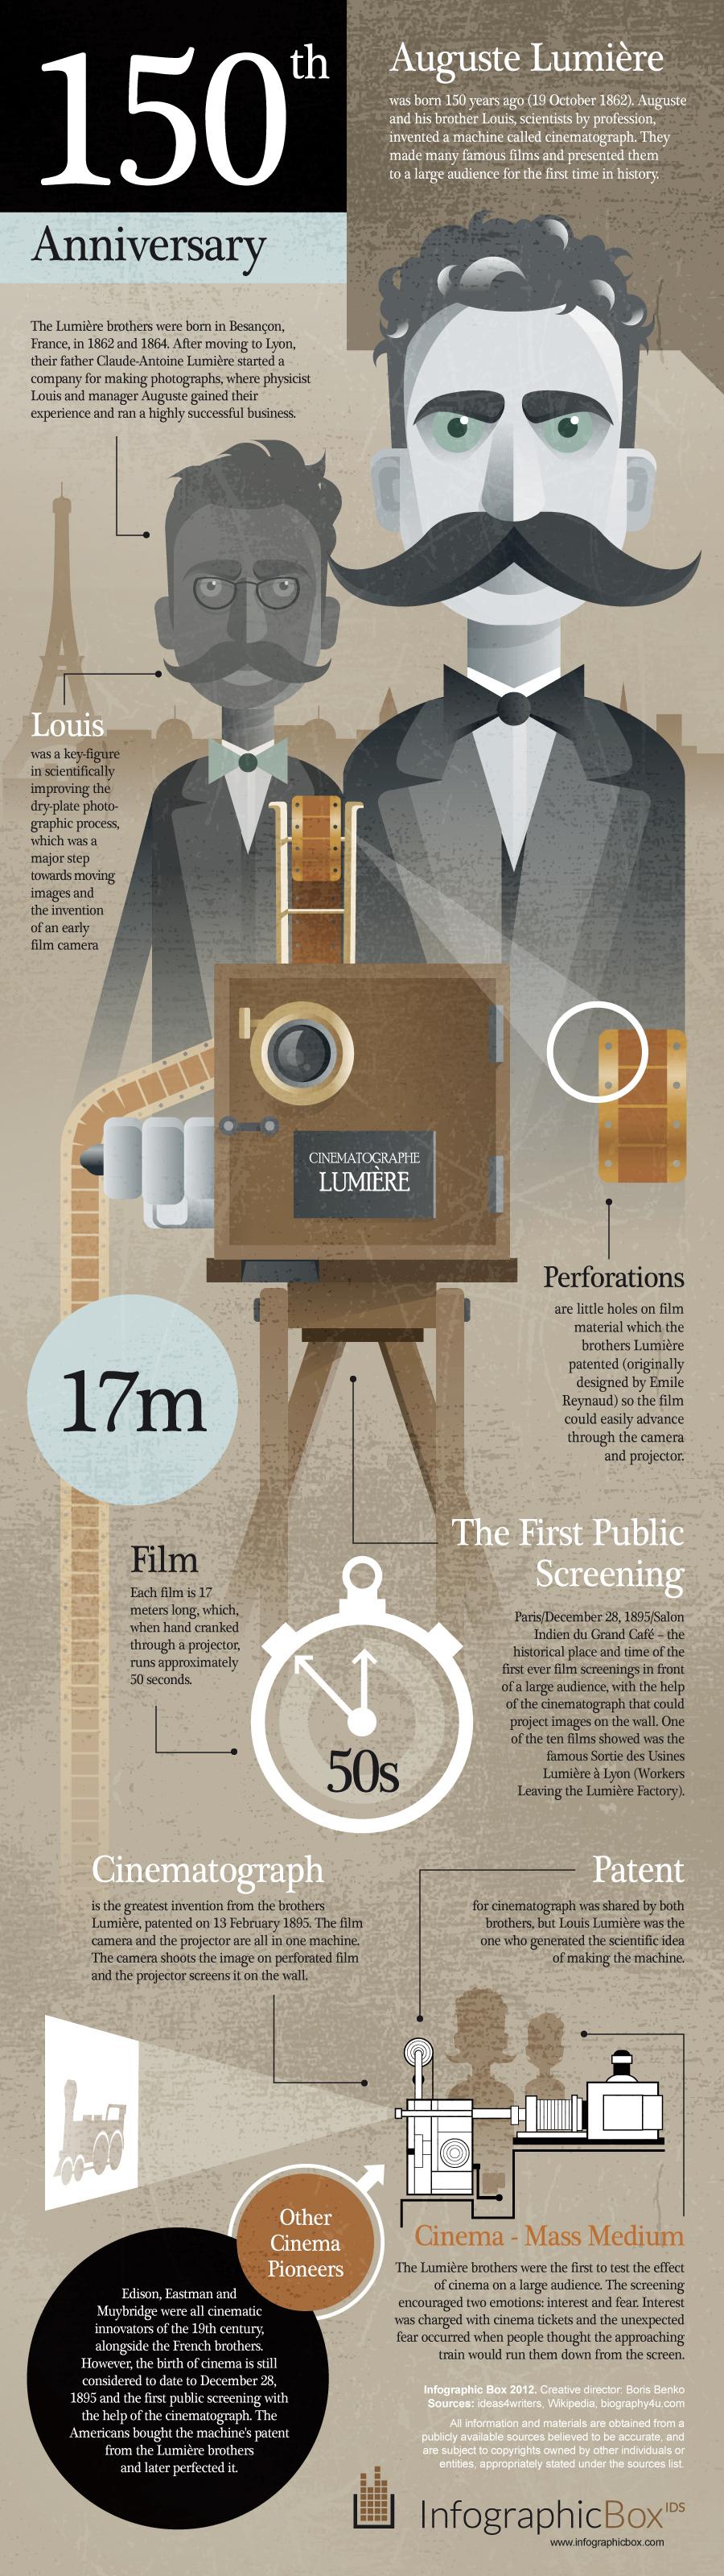 150 Years of Cinema